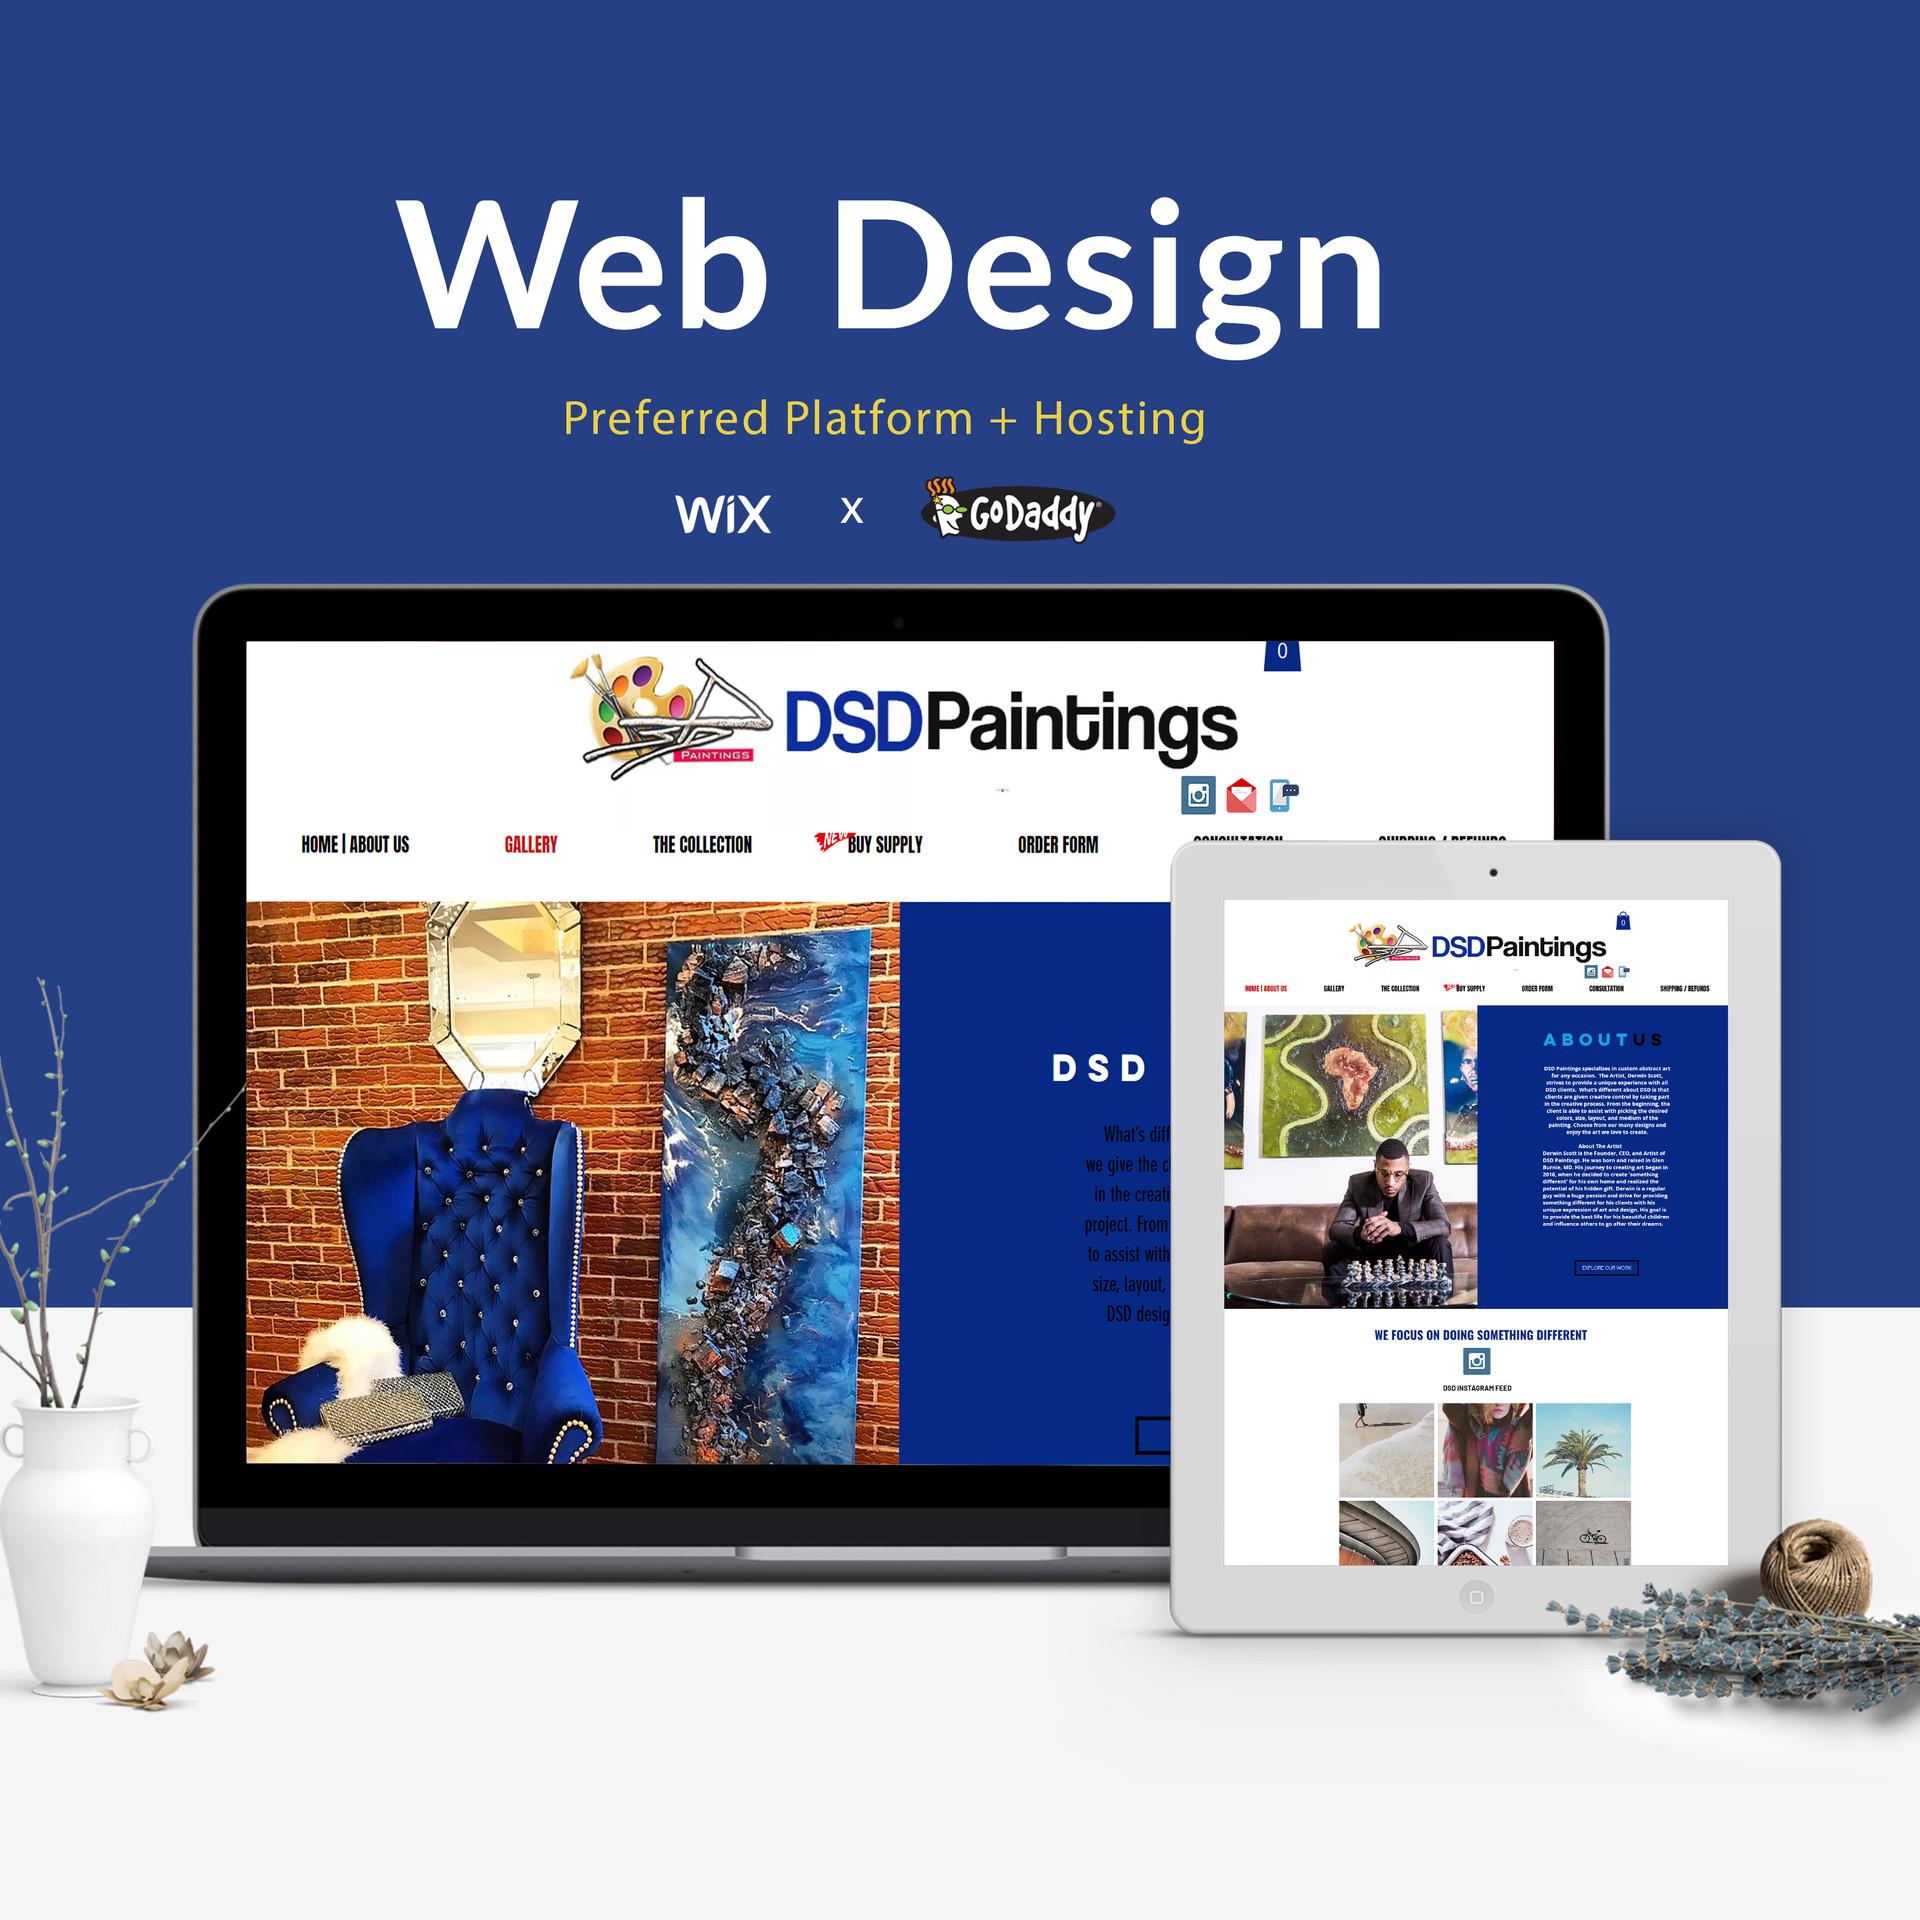 DSD Paintings Web Design